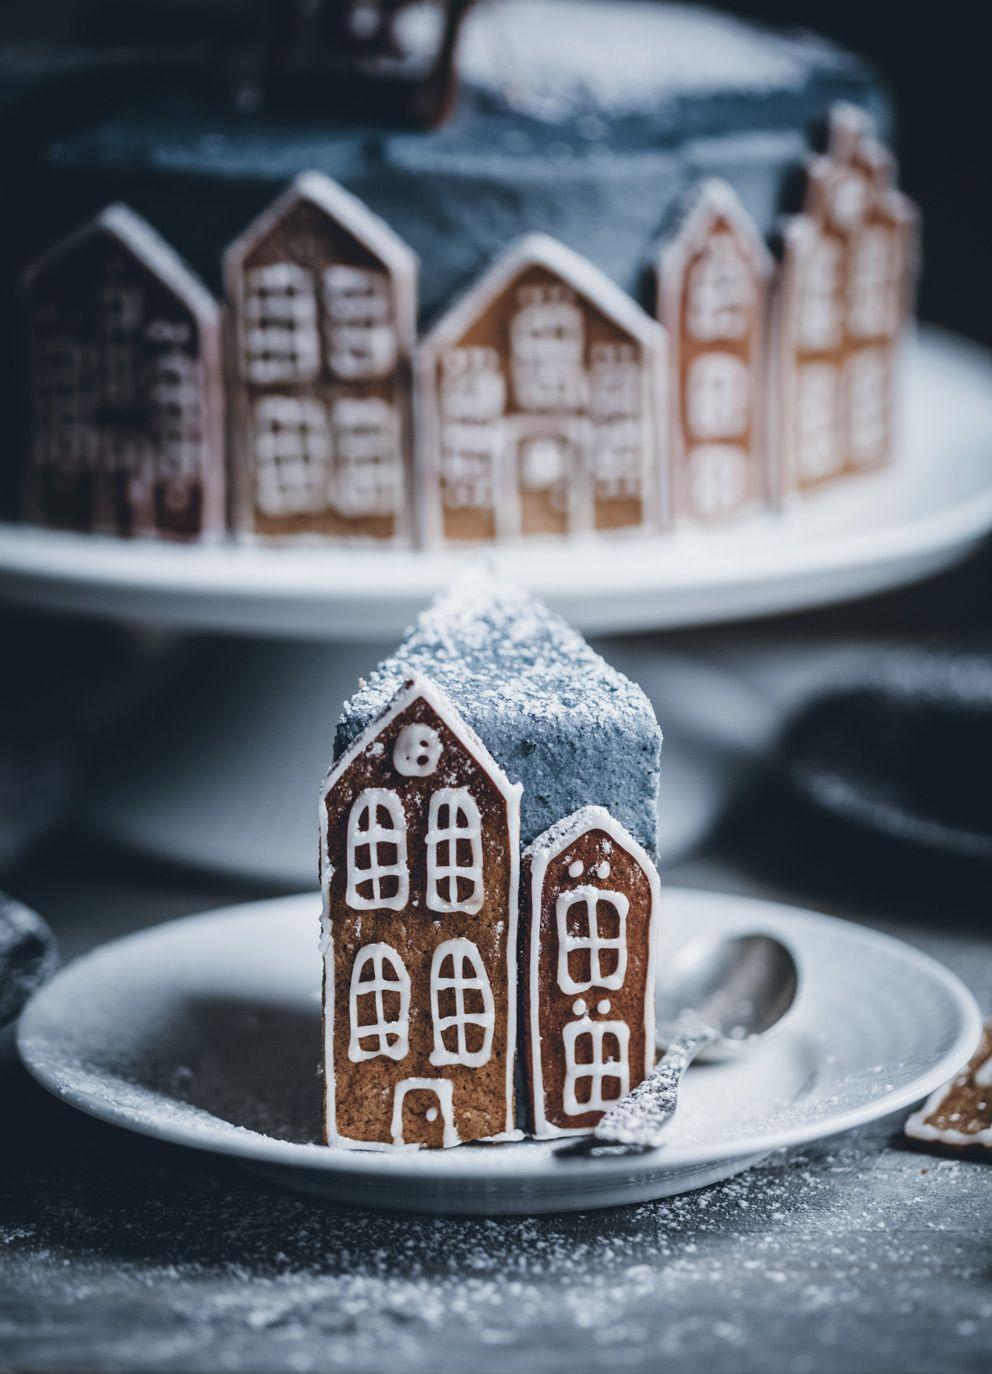 Gingerbread Village Cake Brunch De Noel Idee Gateau Et Recette Gateau